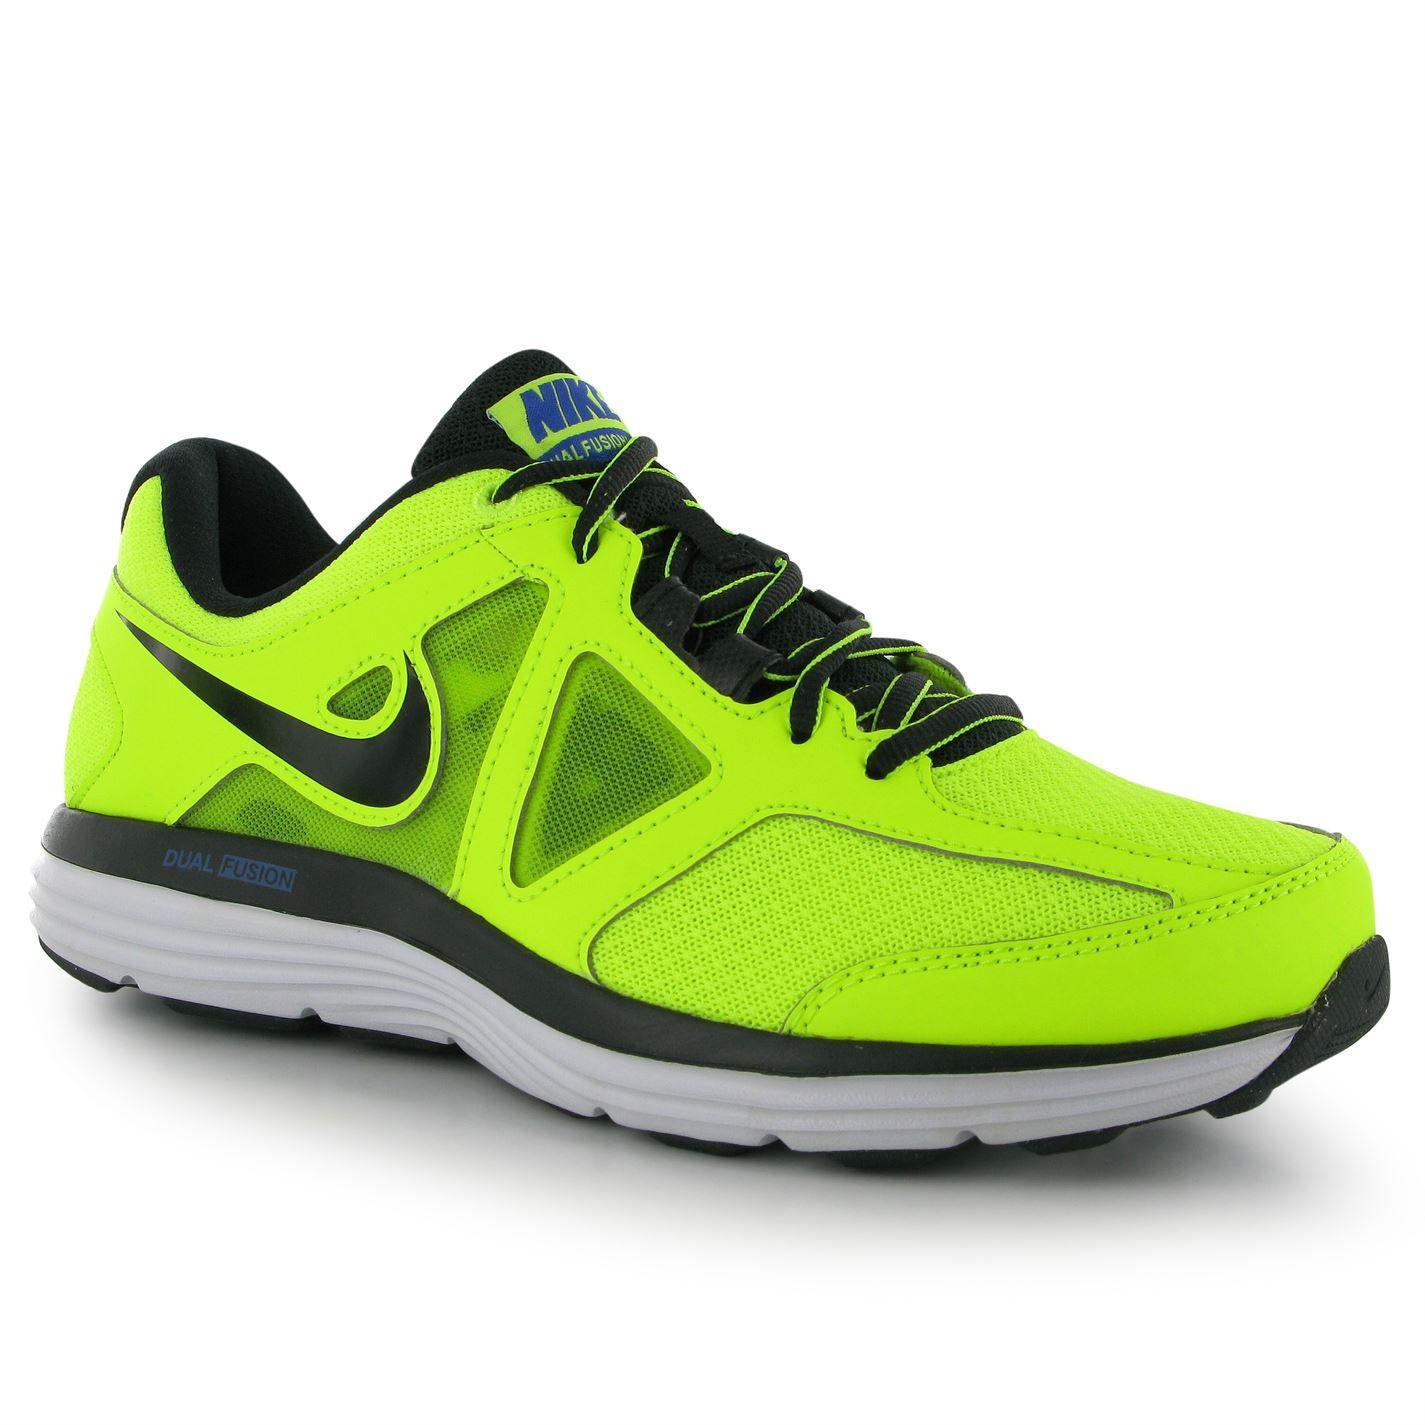 Nike Nike Dual Fusion Lite Trainers Mens Mens Trainers